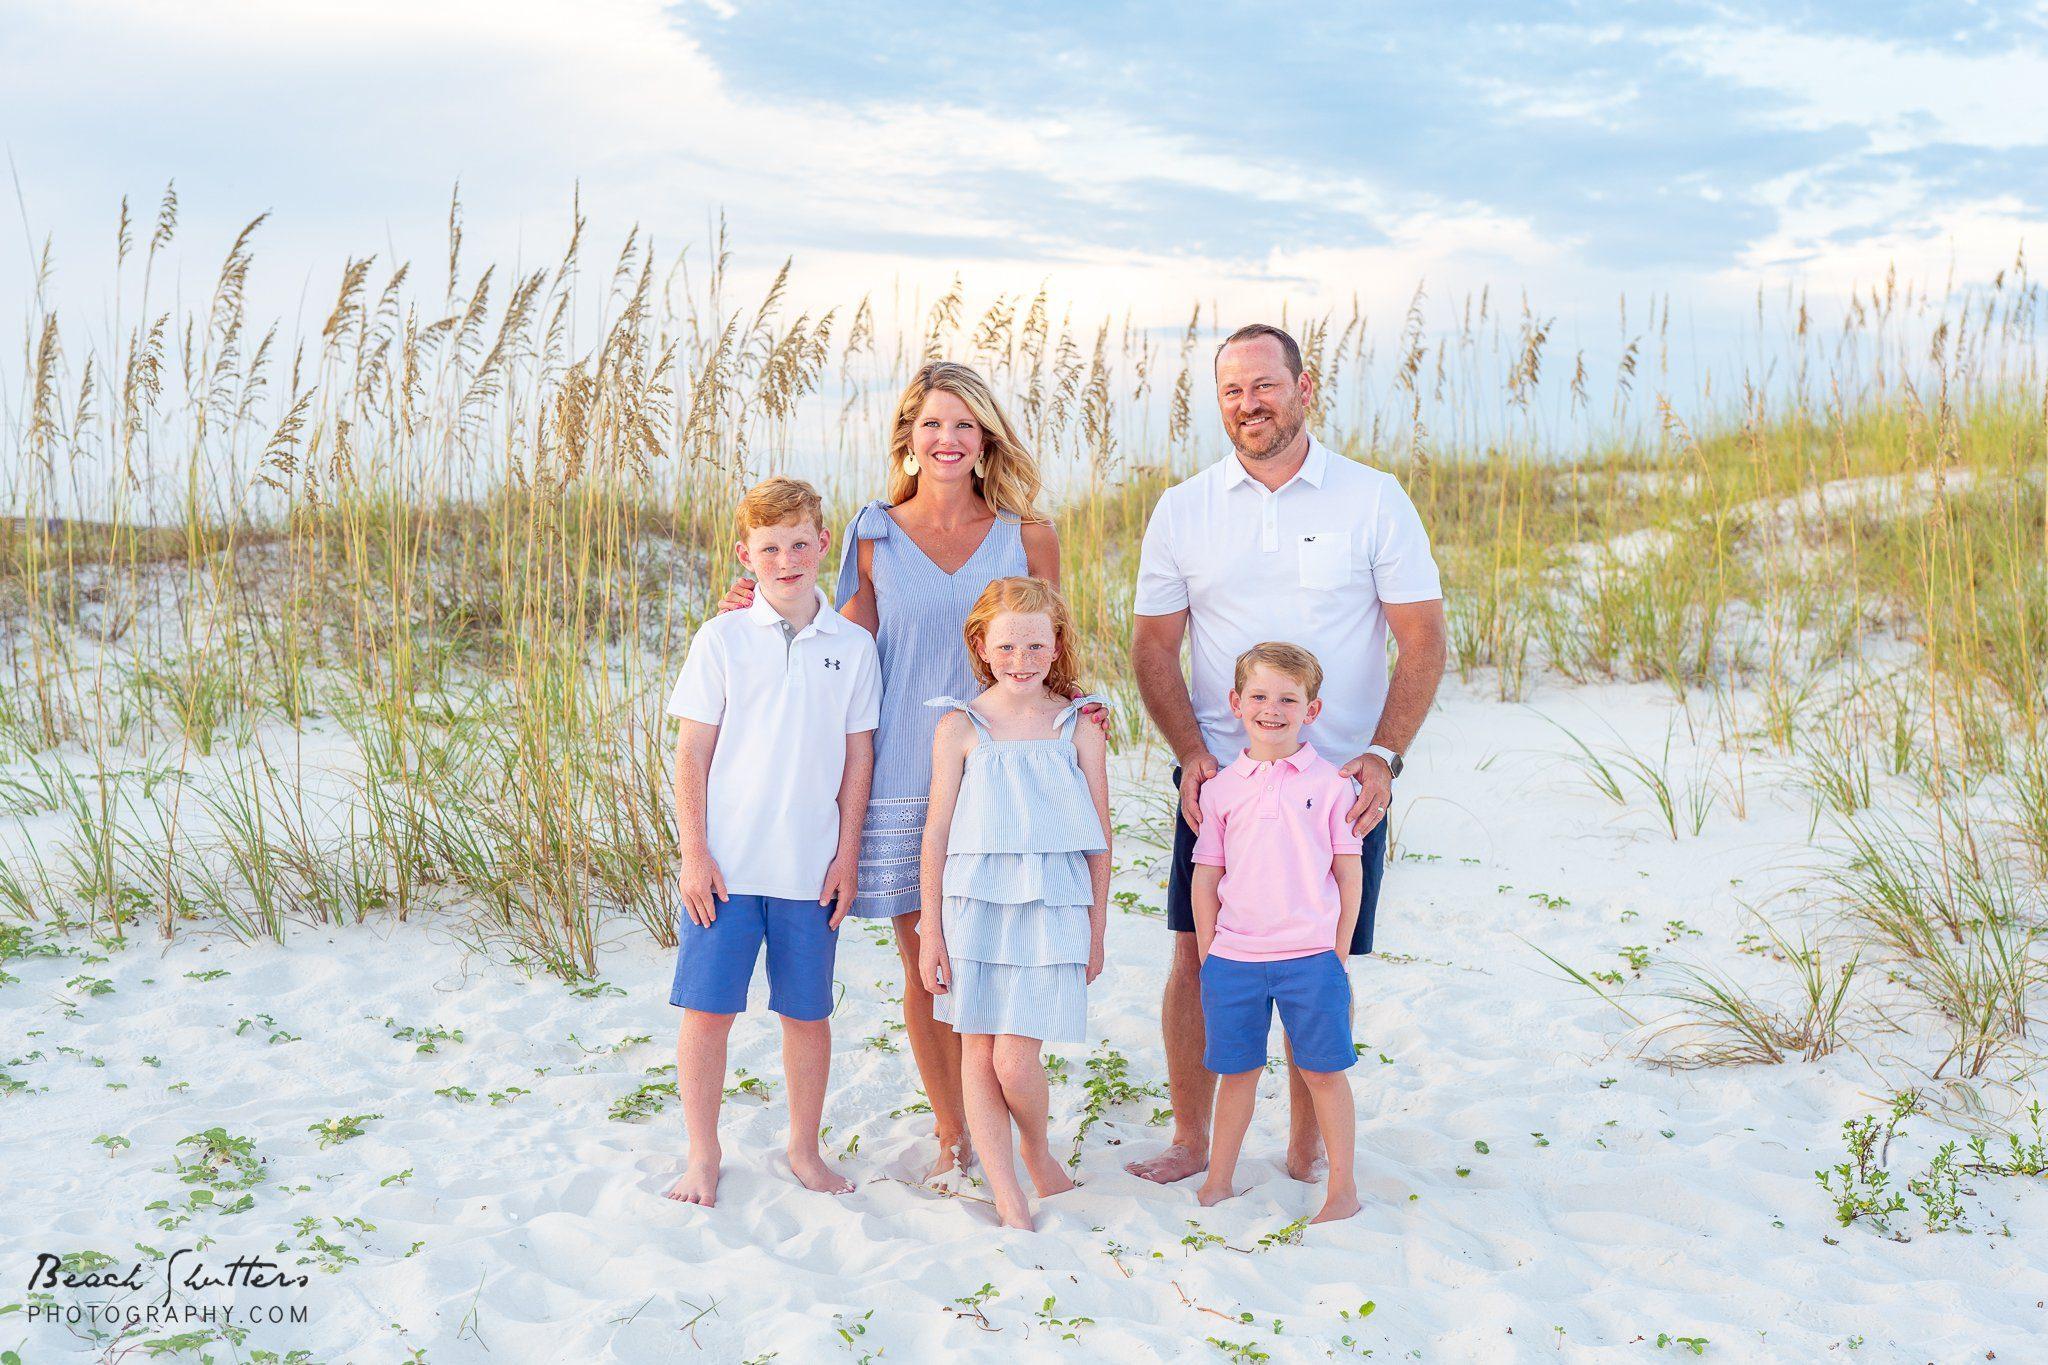 top photographers in Orange Beach Alabama having fun